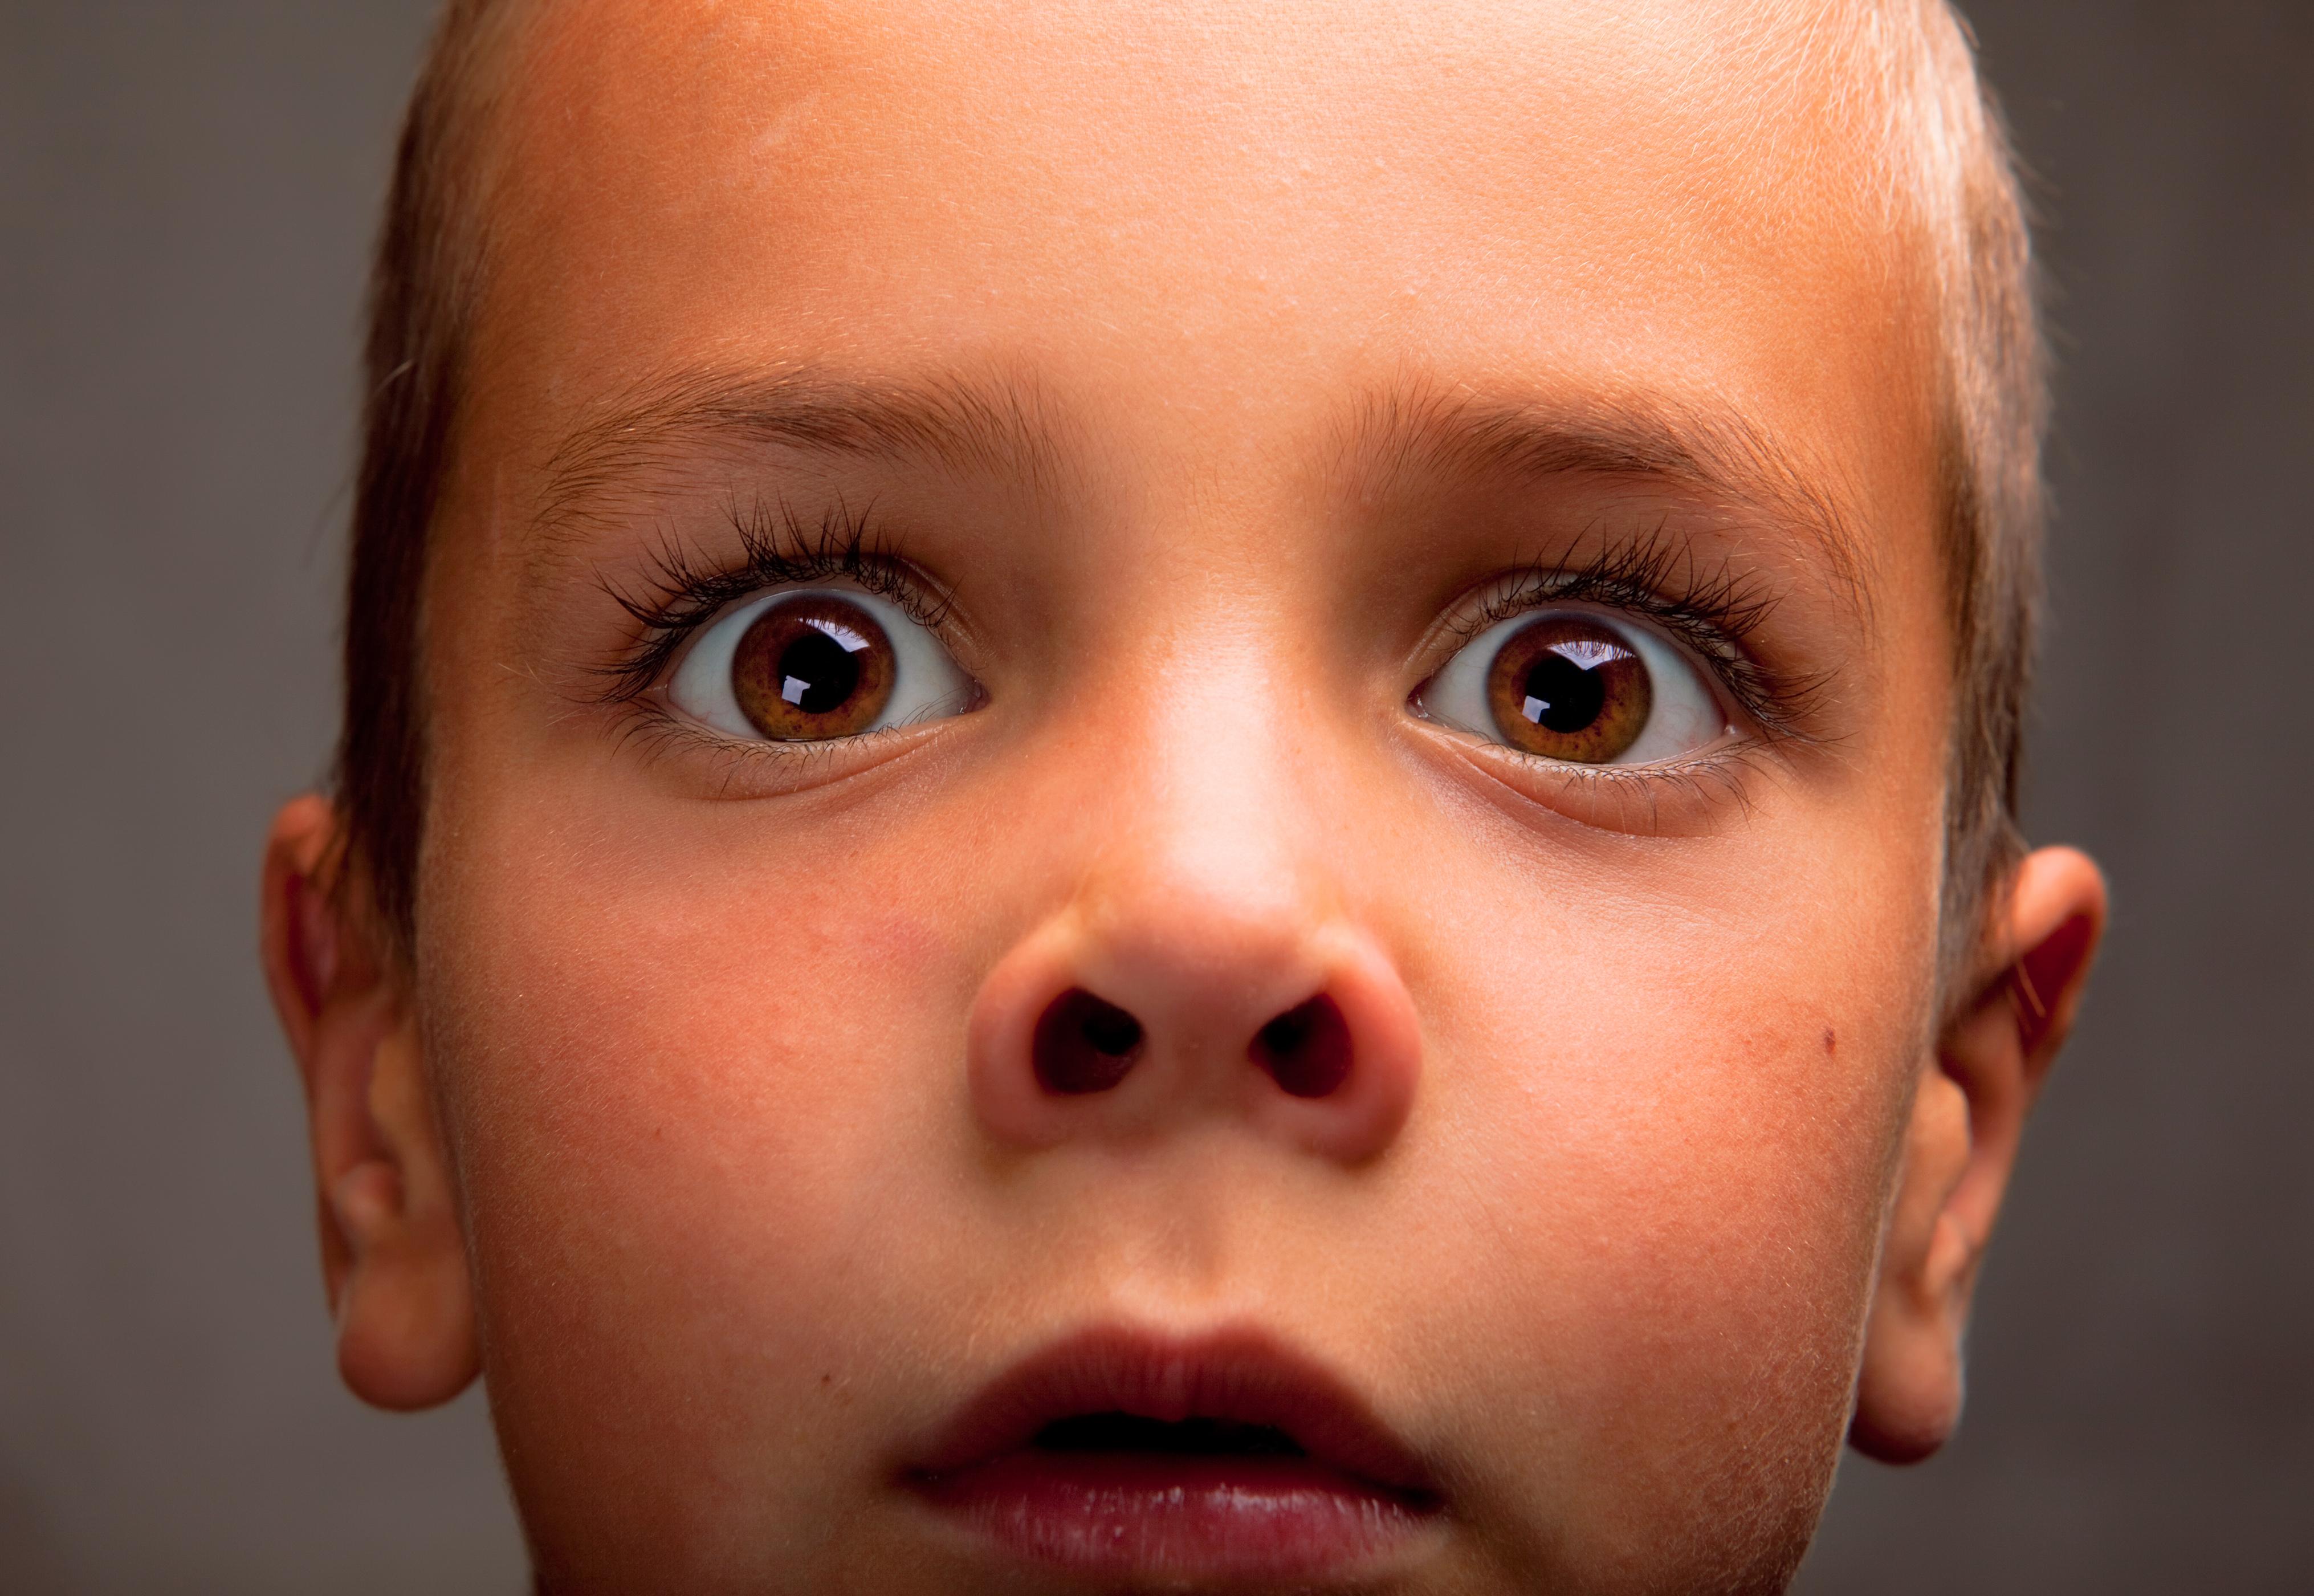 free photo: surprised boy - looking, one, surprised - free download